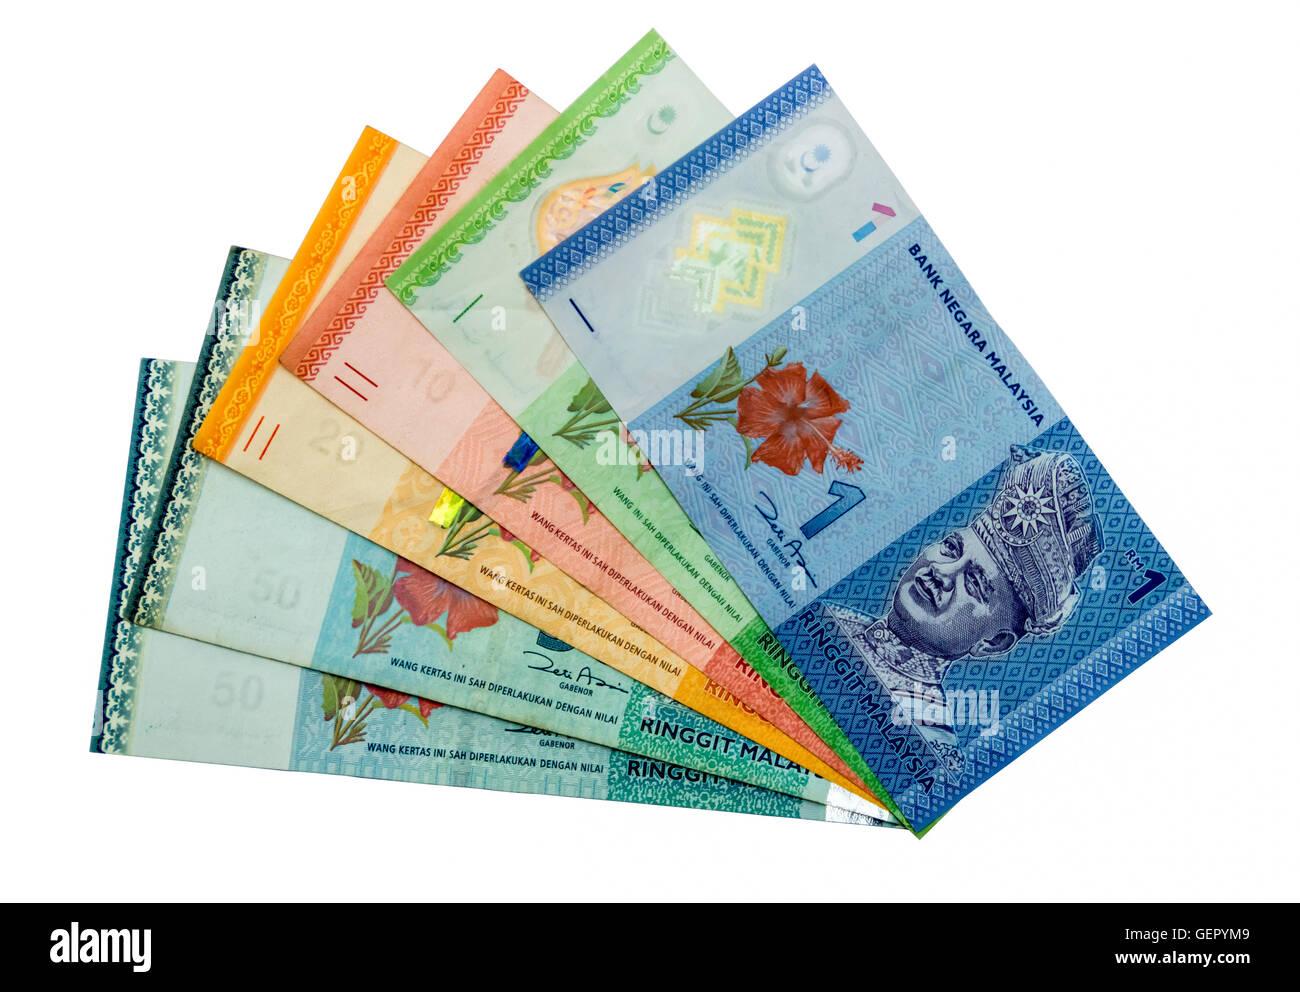 International currencies  ringgit malaysia - Stock Image